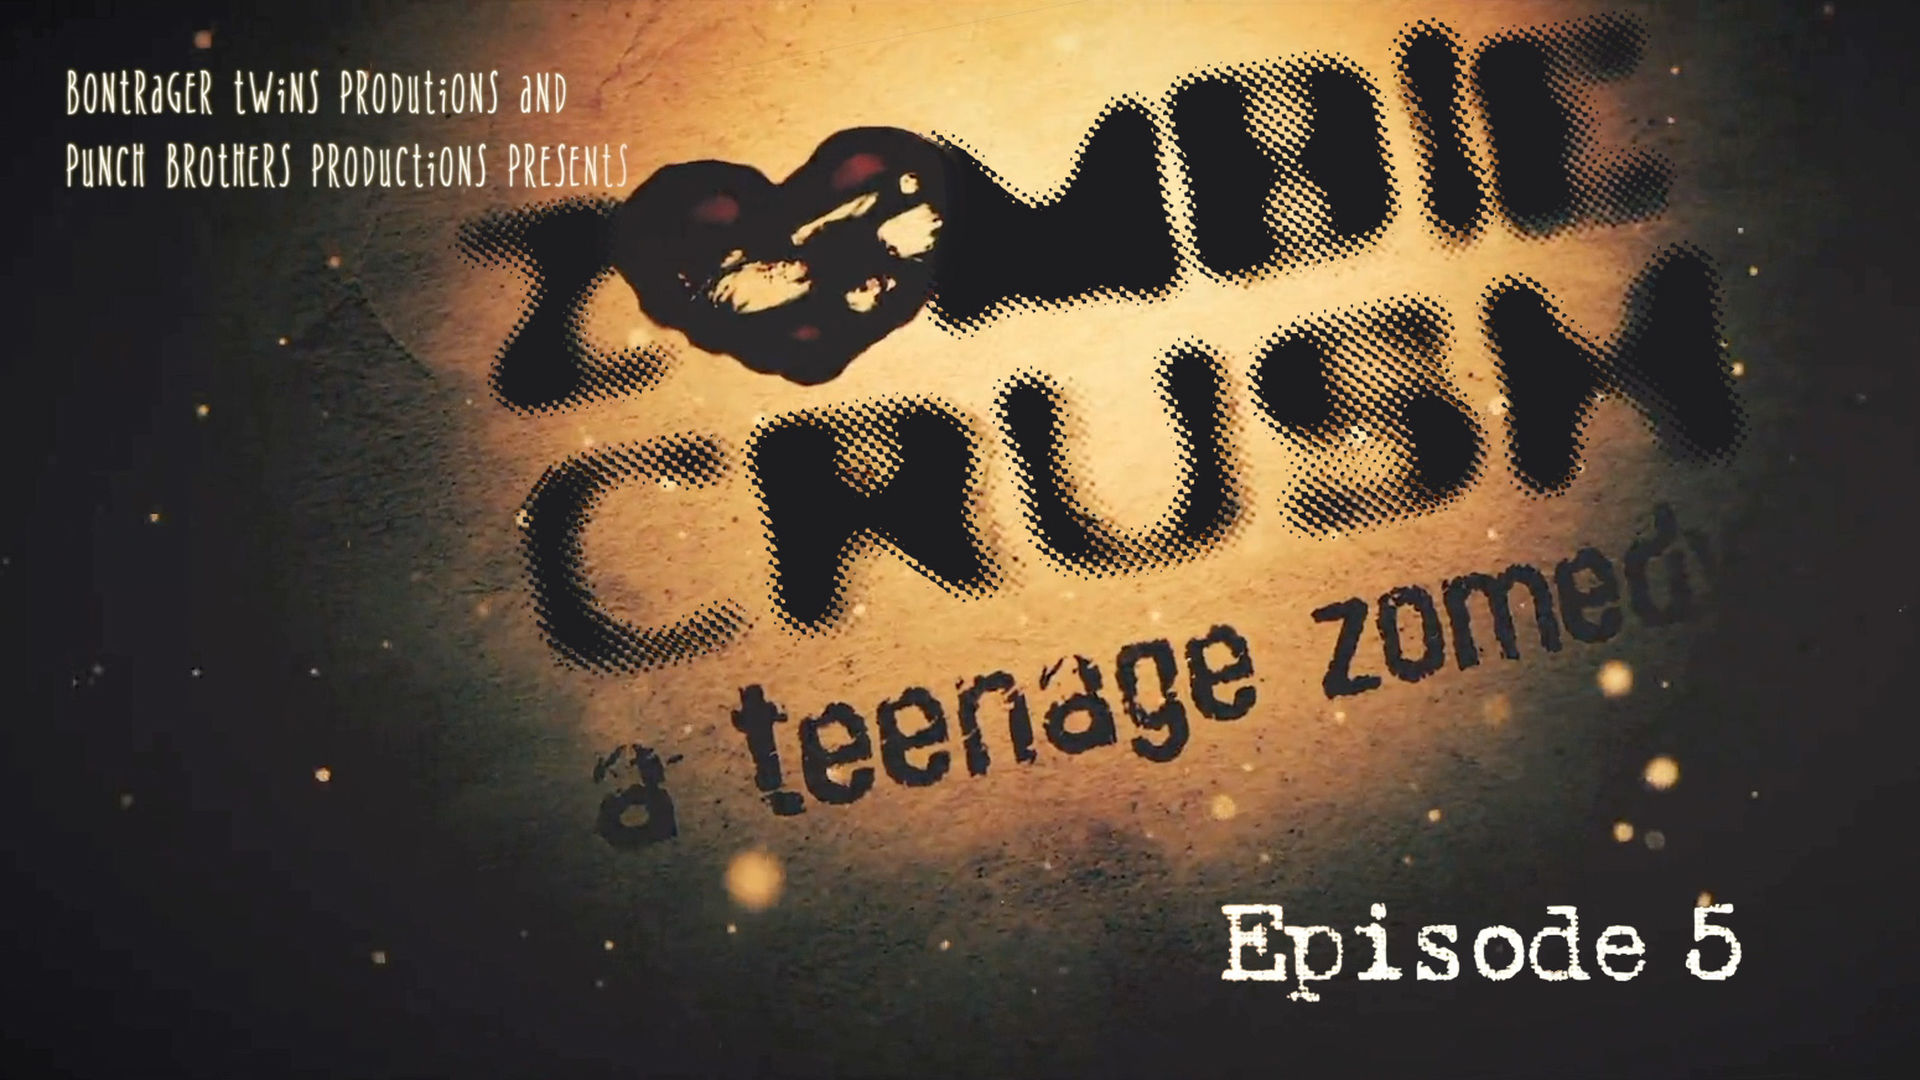 Zombie Crush - Ep5 - A Teenage Zomedy